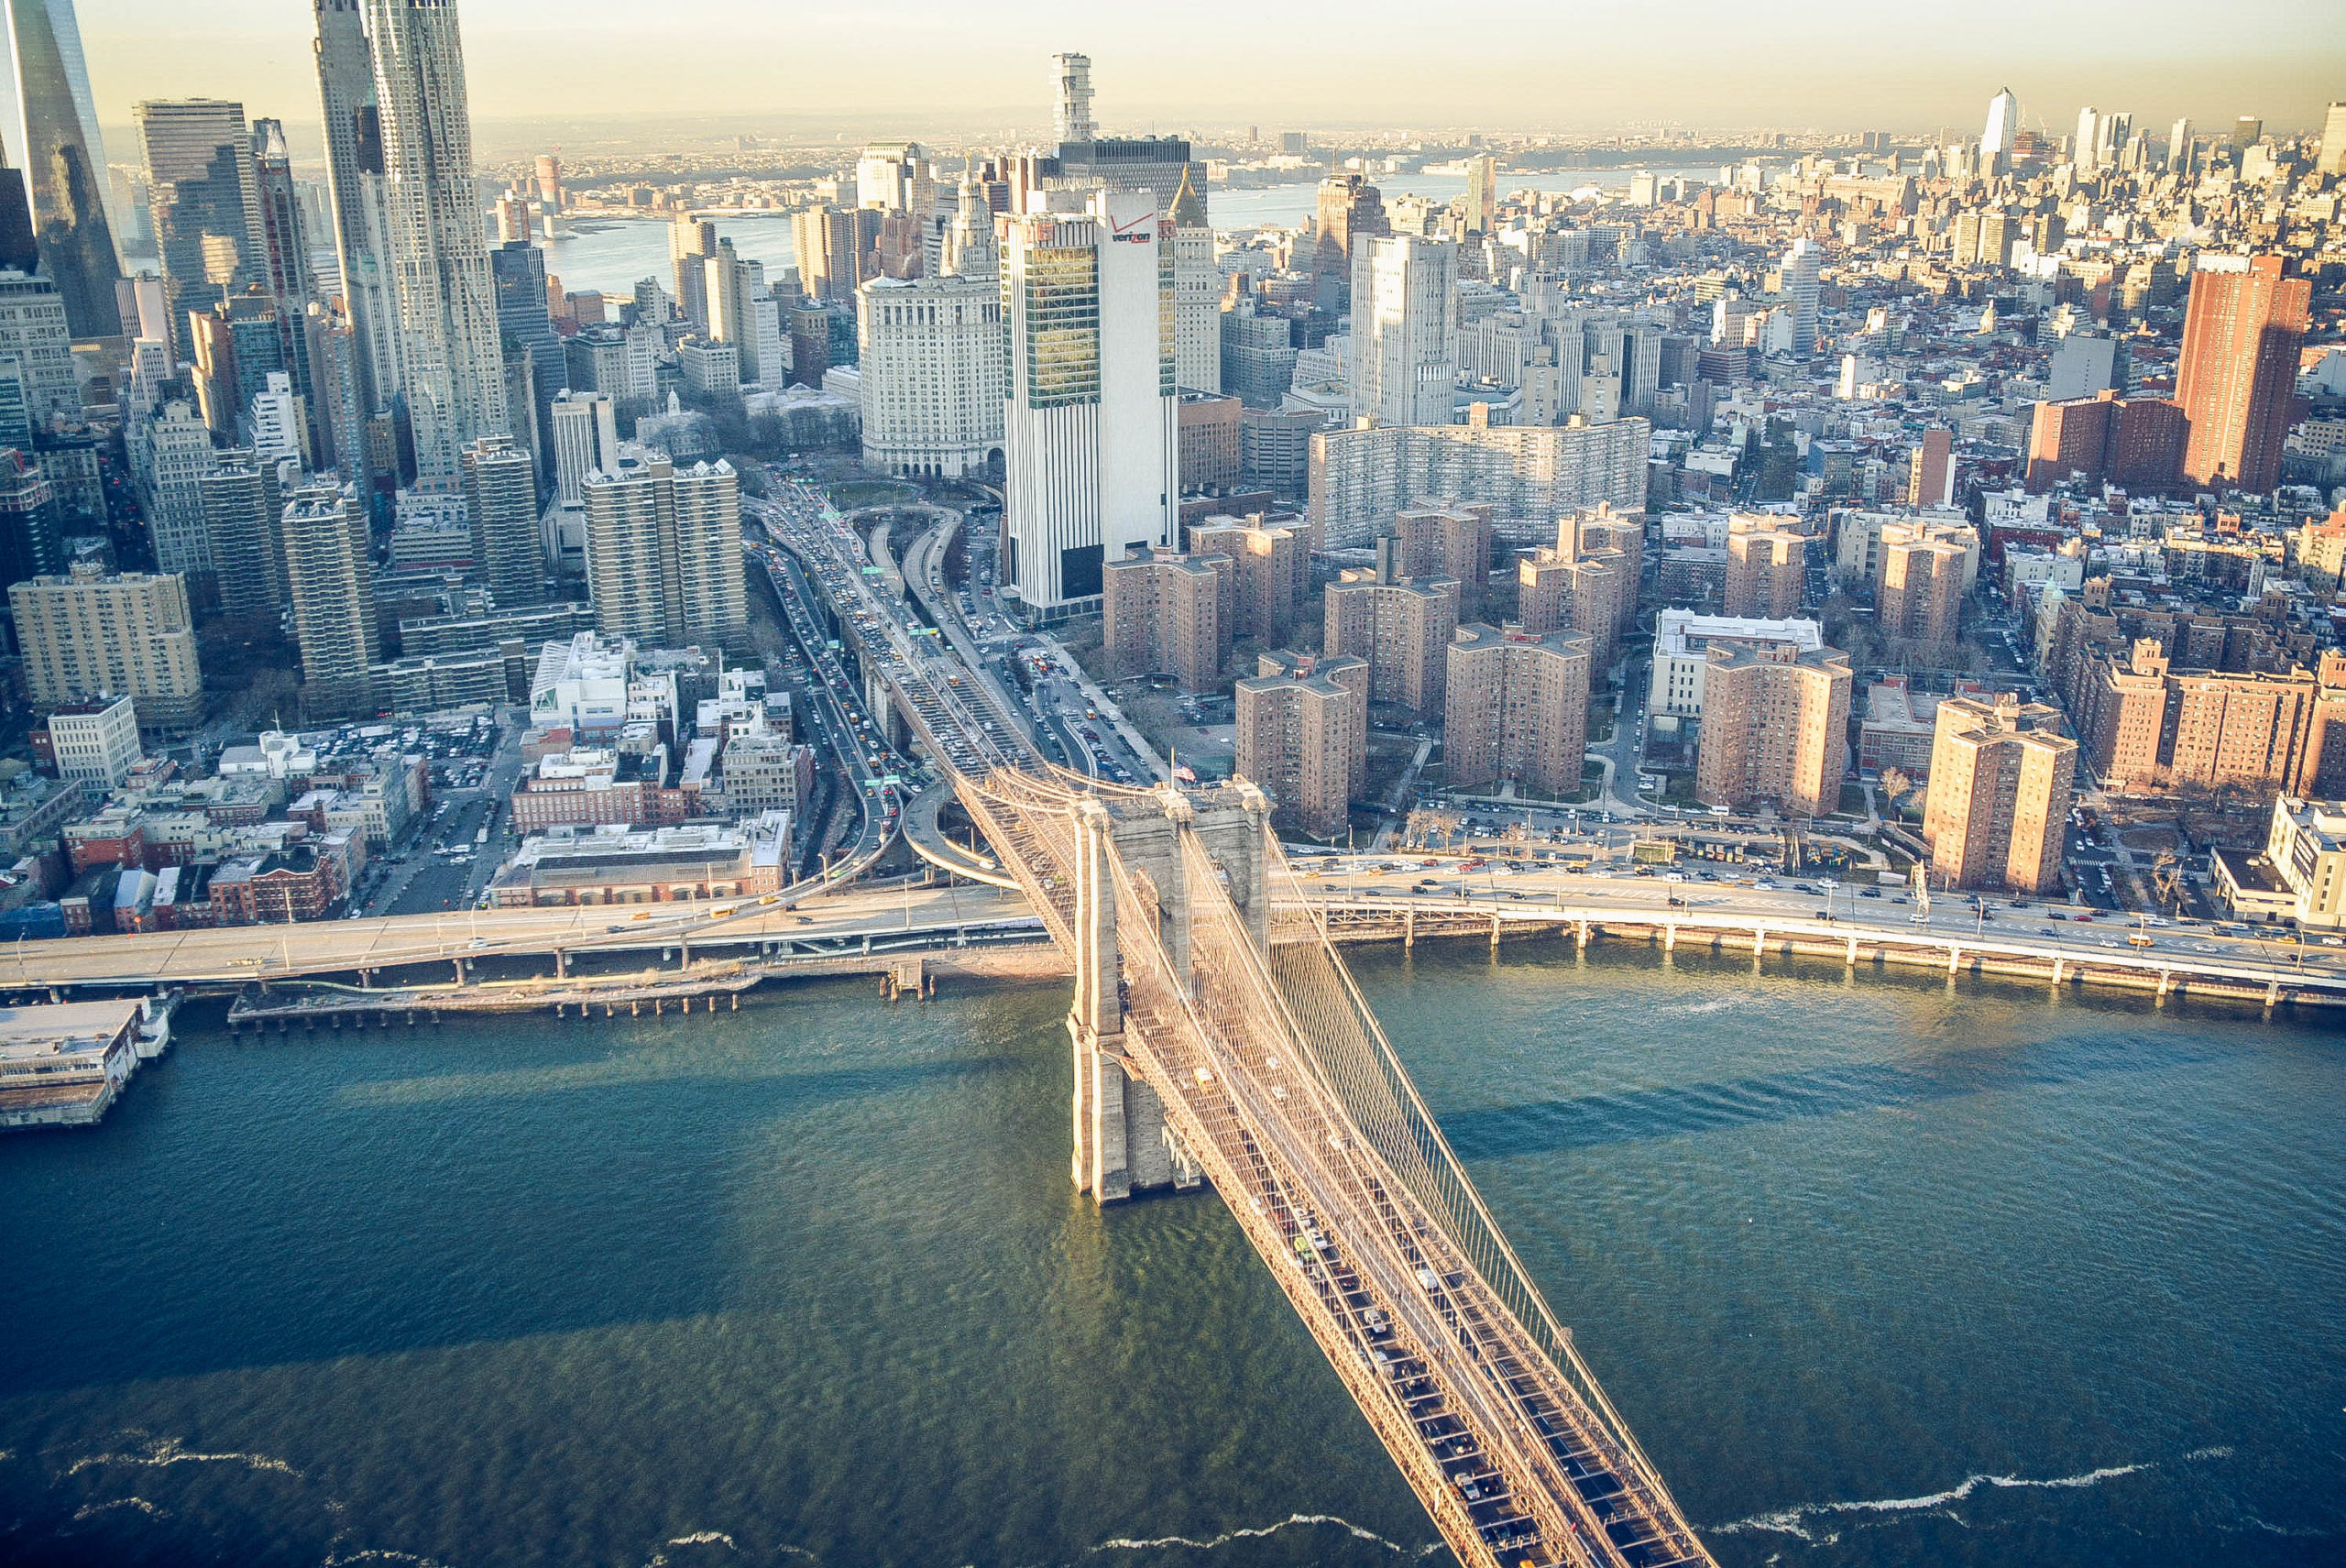 flynyon fly nyon new york